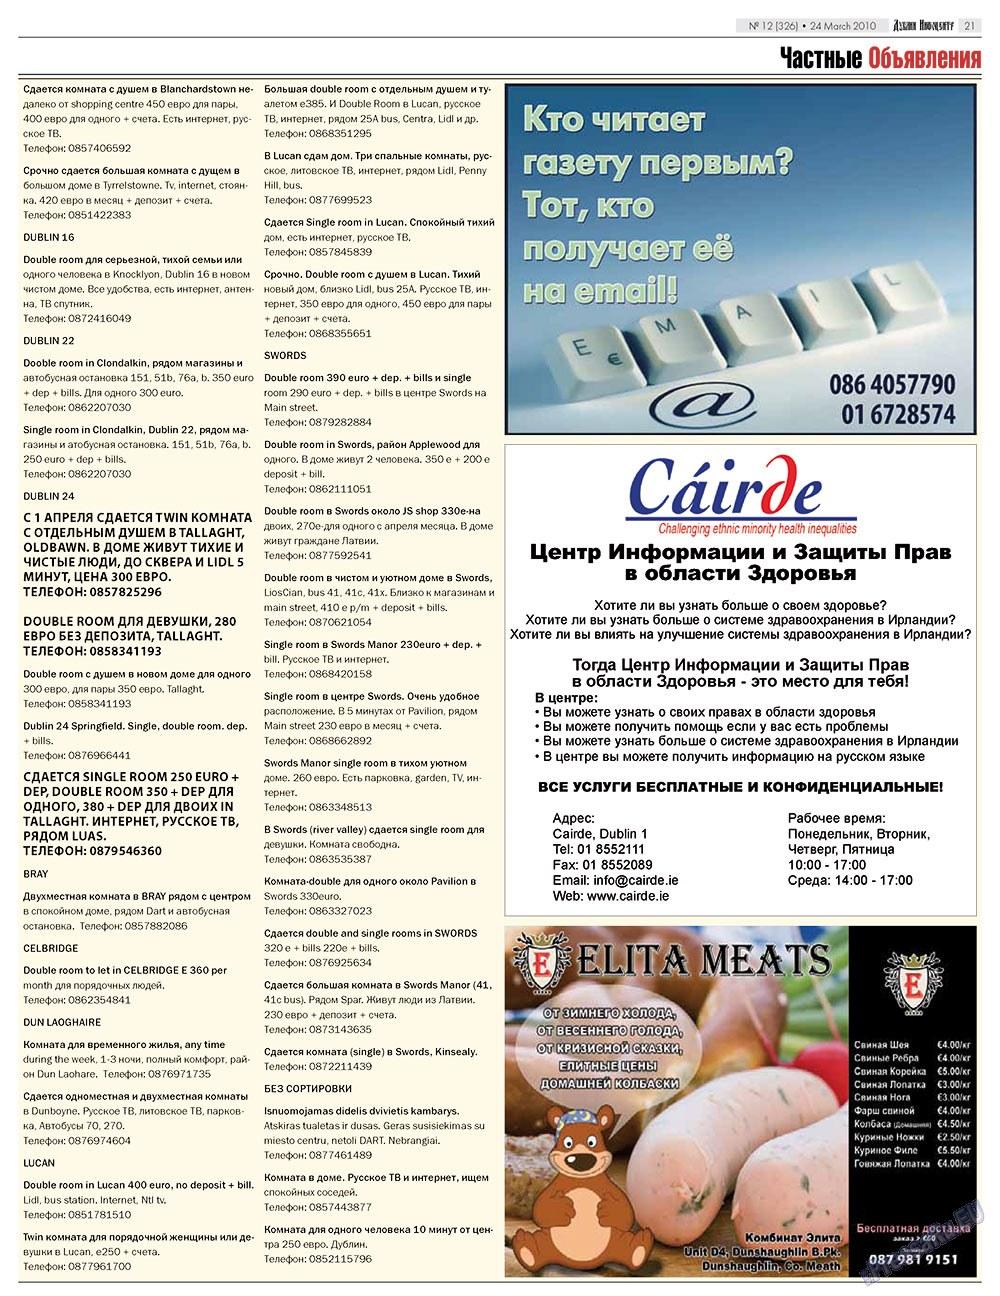 Дублин инфоцентр (газета). 2010 год, номер 12, стр. 21